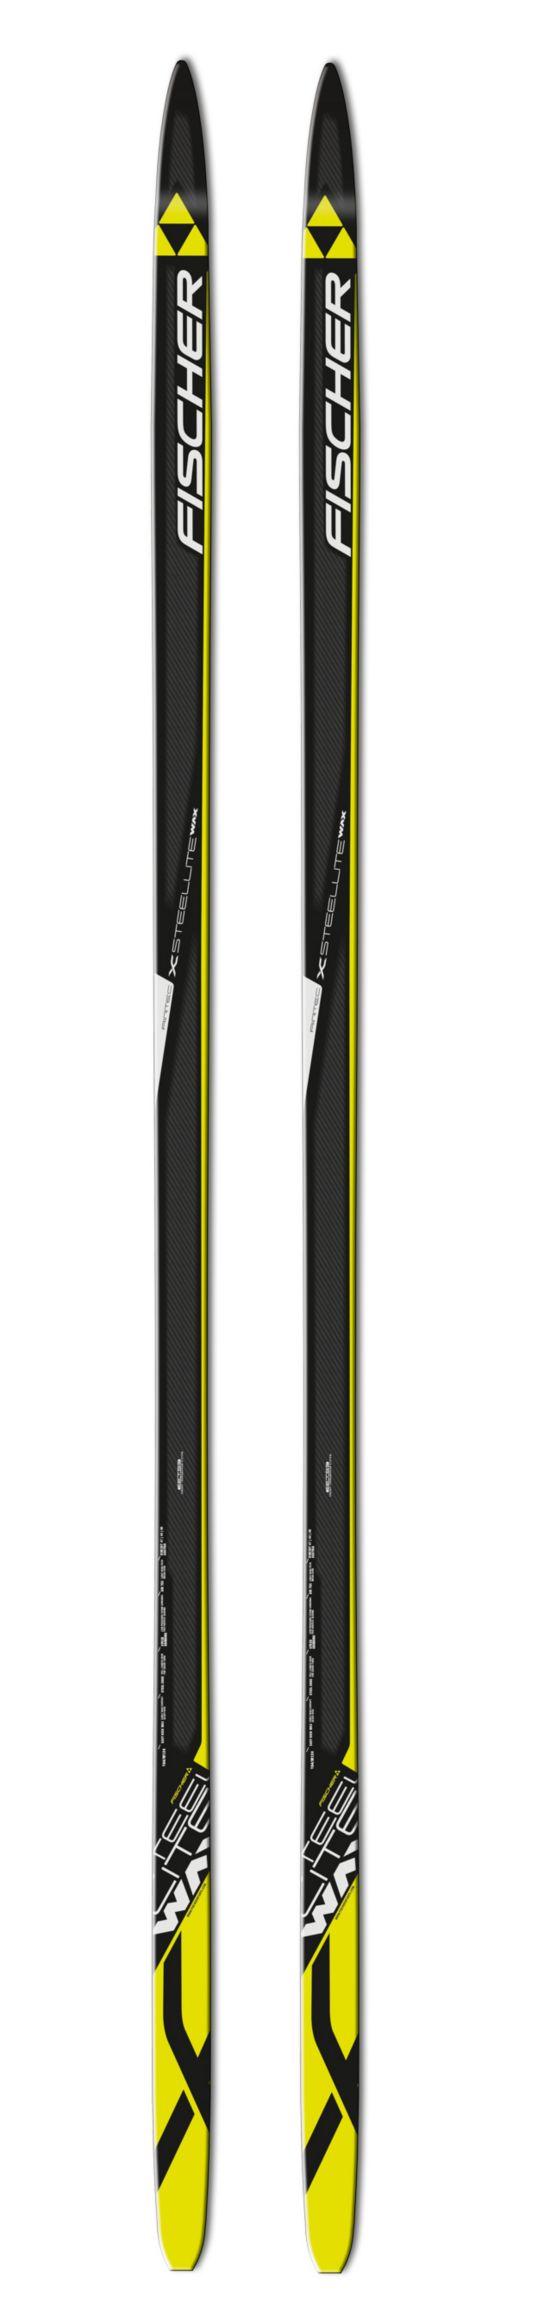 Steel Lite Ski